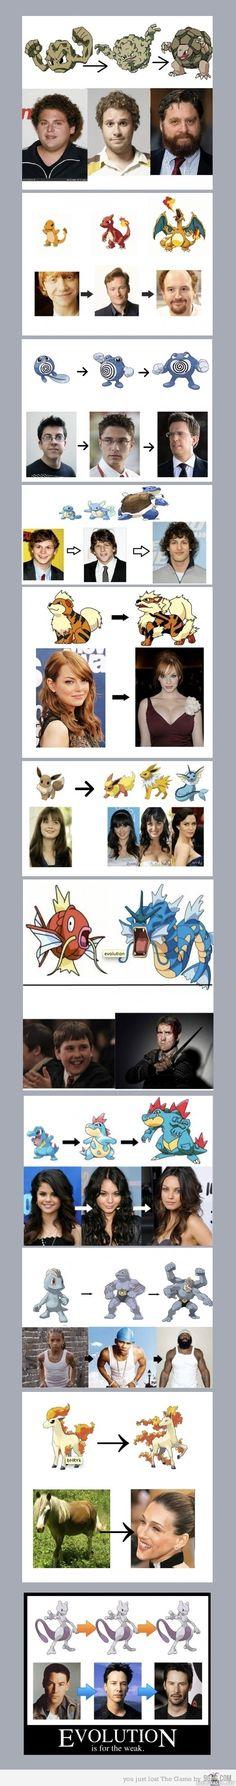 hahaha cool concept